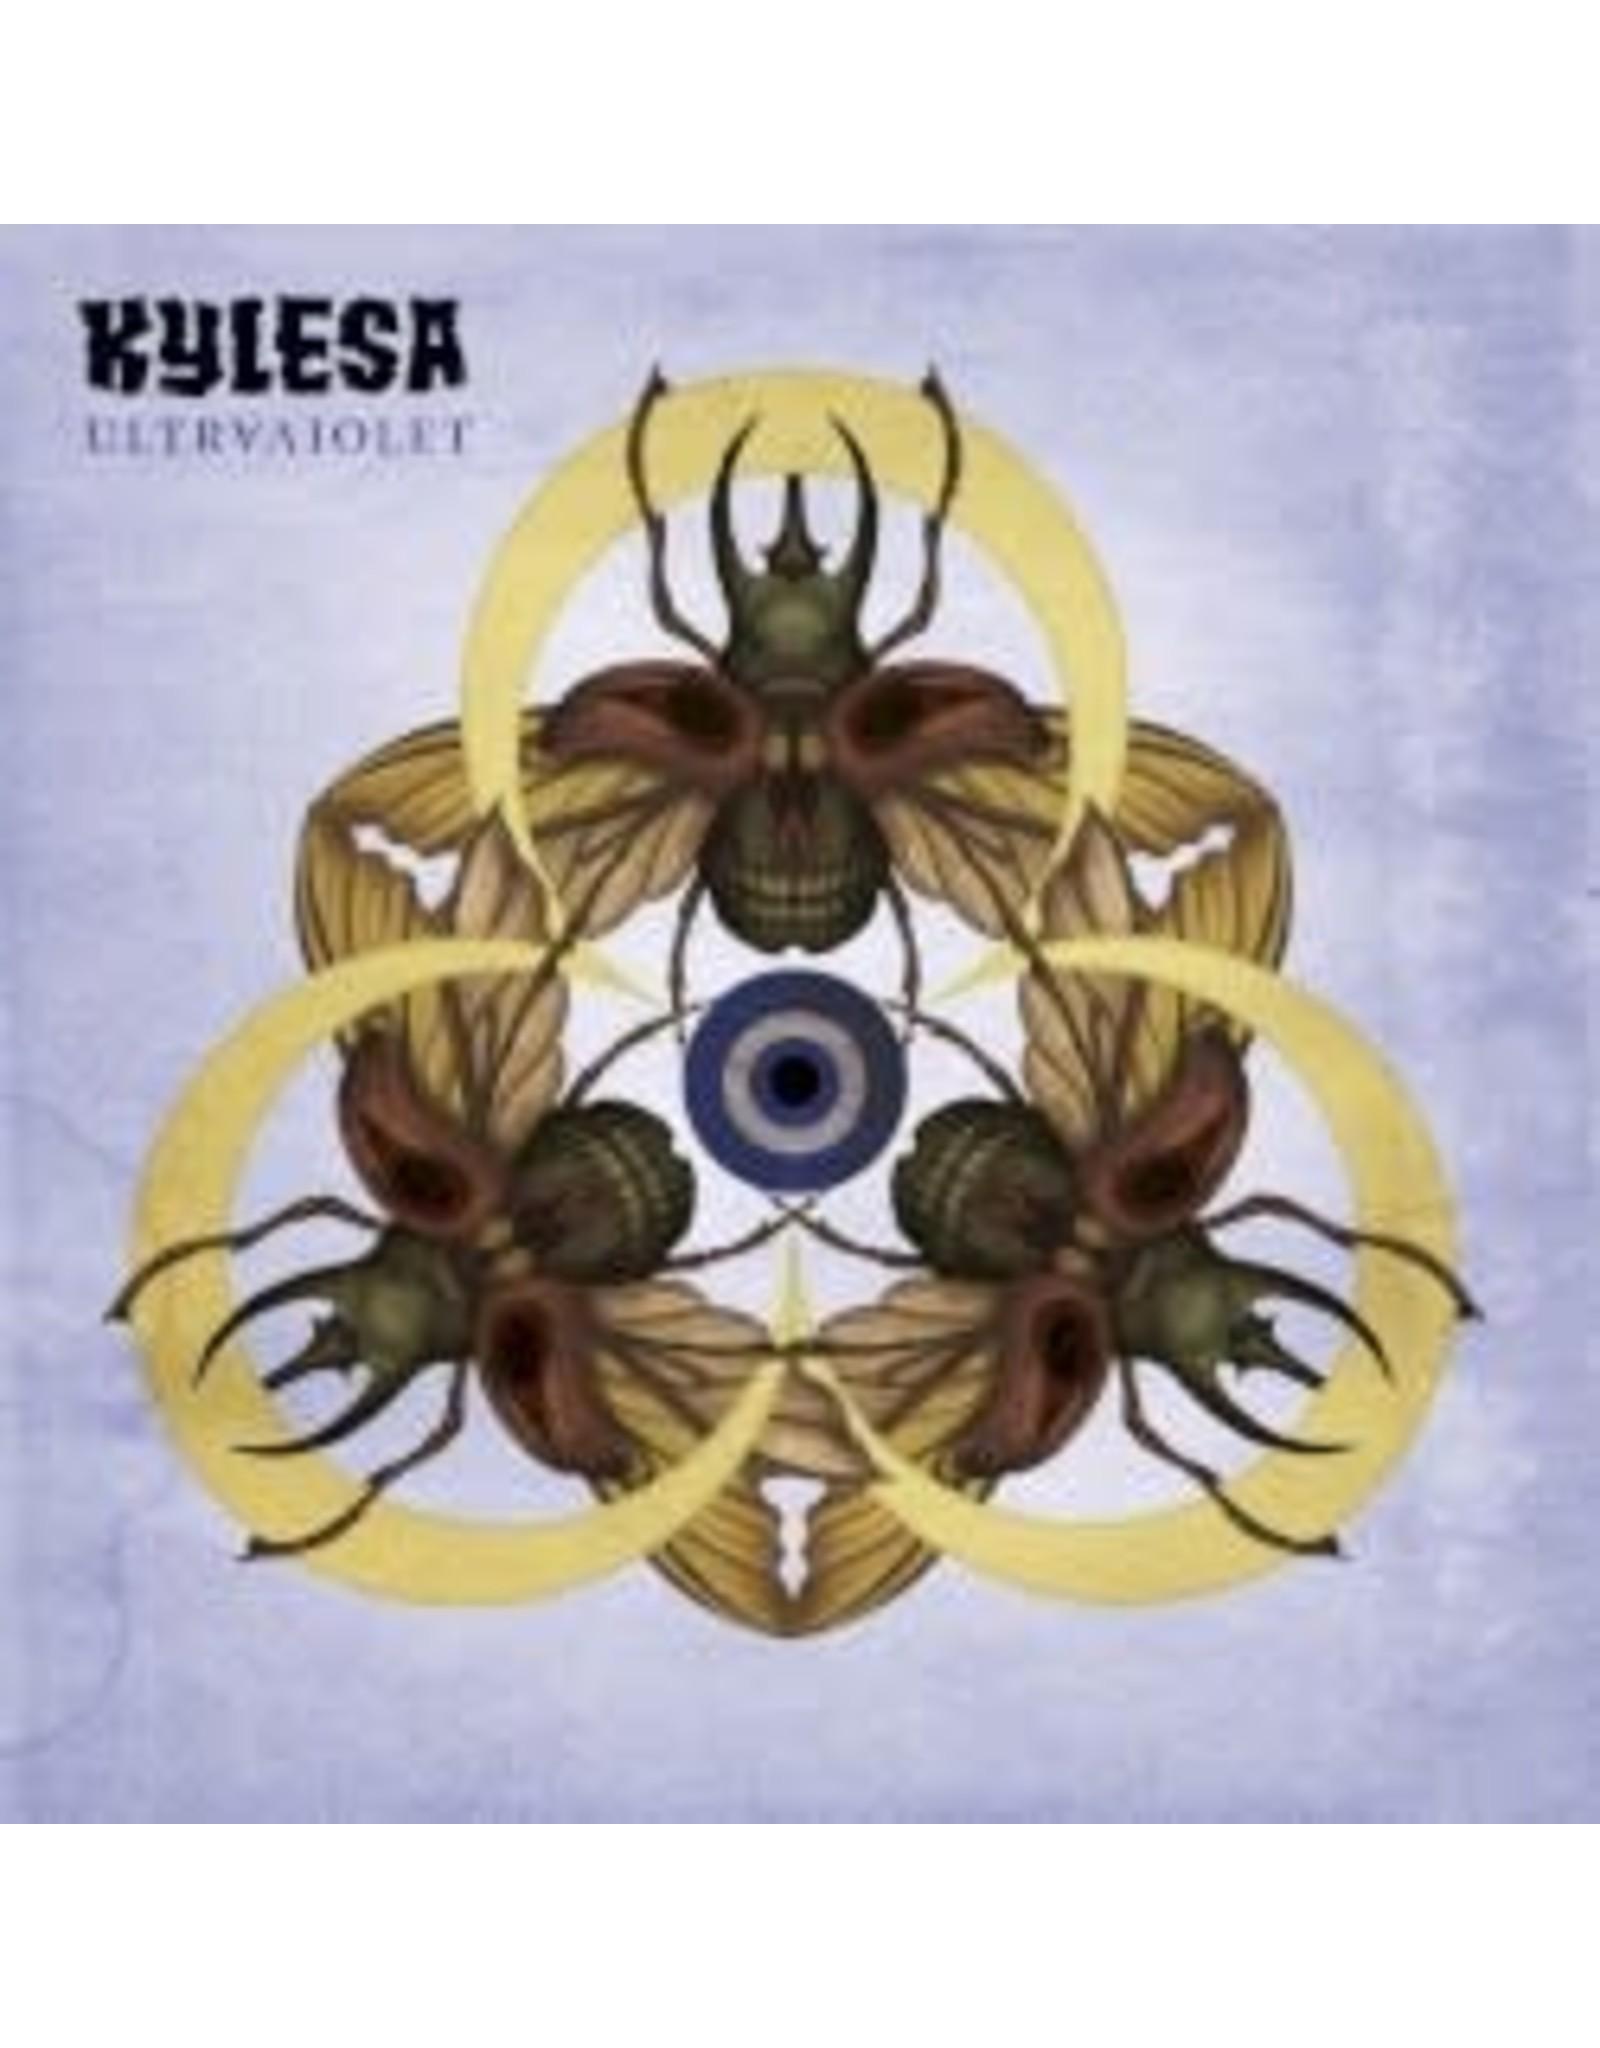 Kylesa - Ultraviolet LP